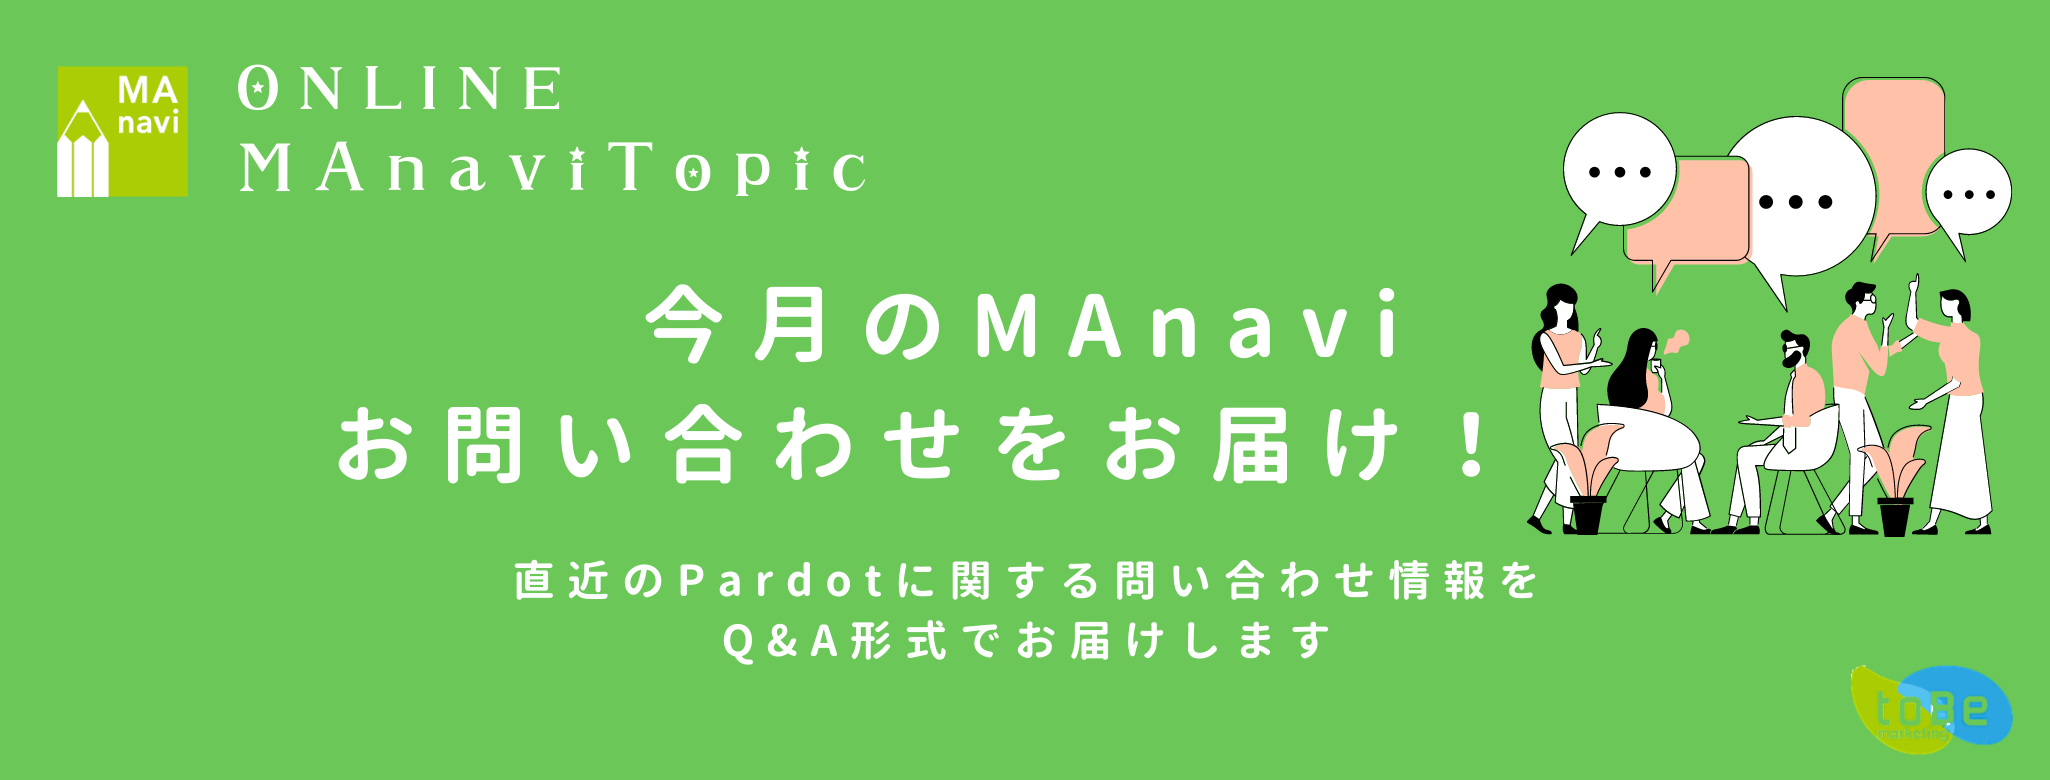 【MAnaviオンライン】MAnavi Topic ~今月の MAnavi お問い合わせをお届け~